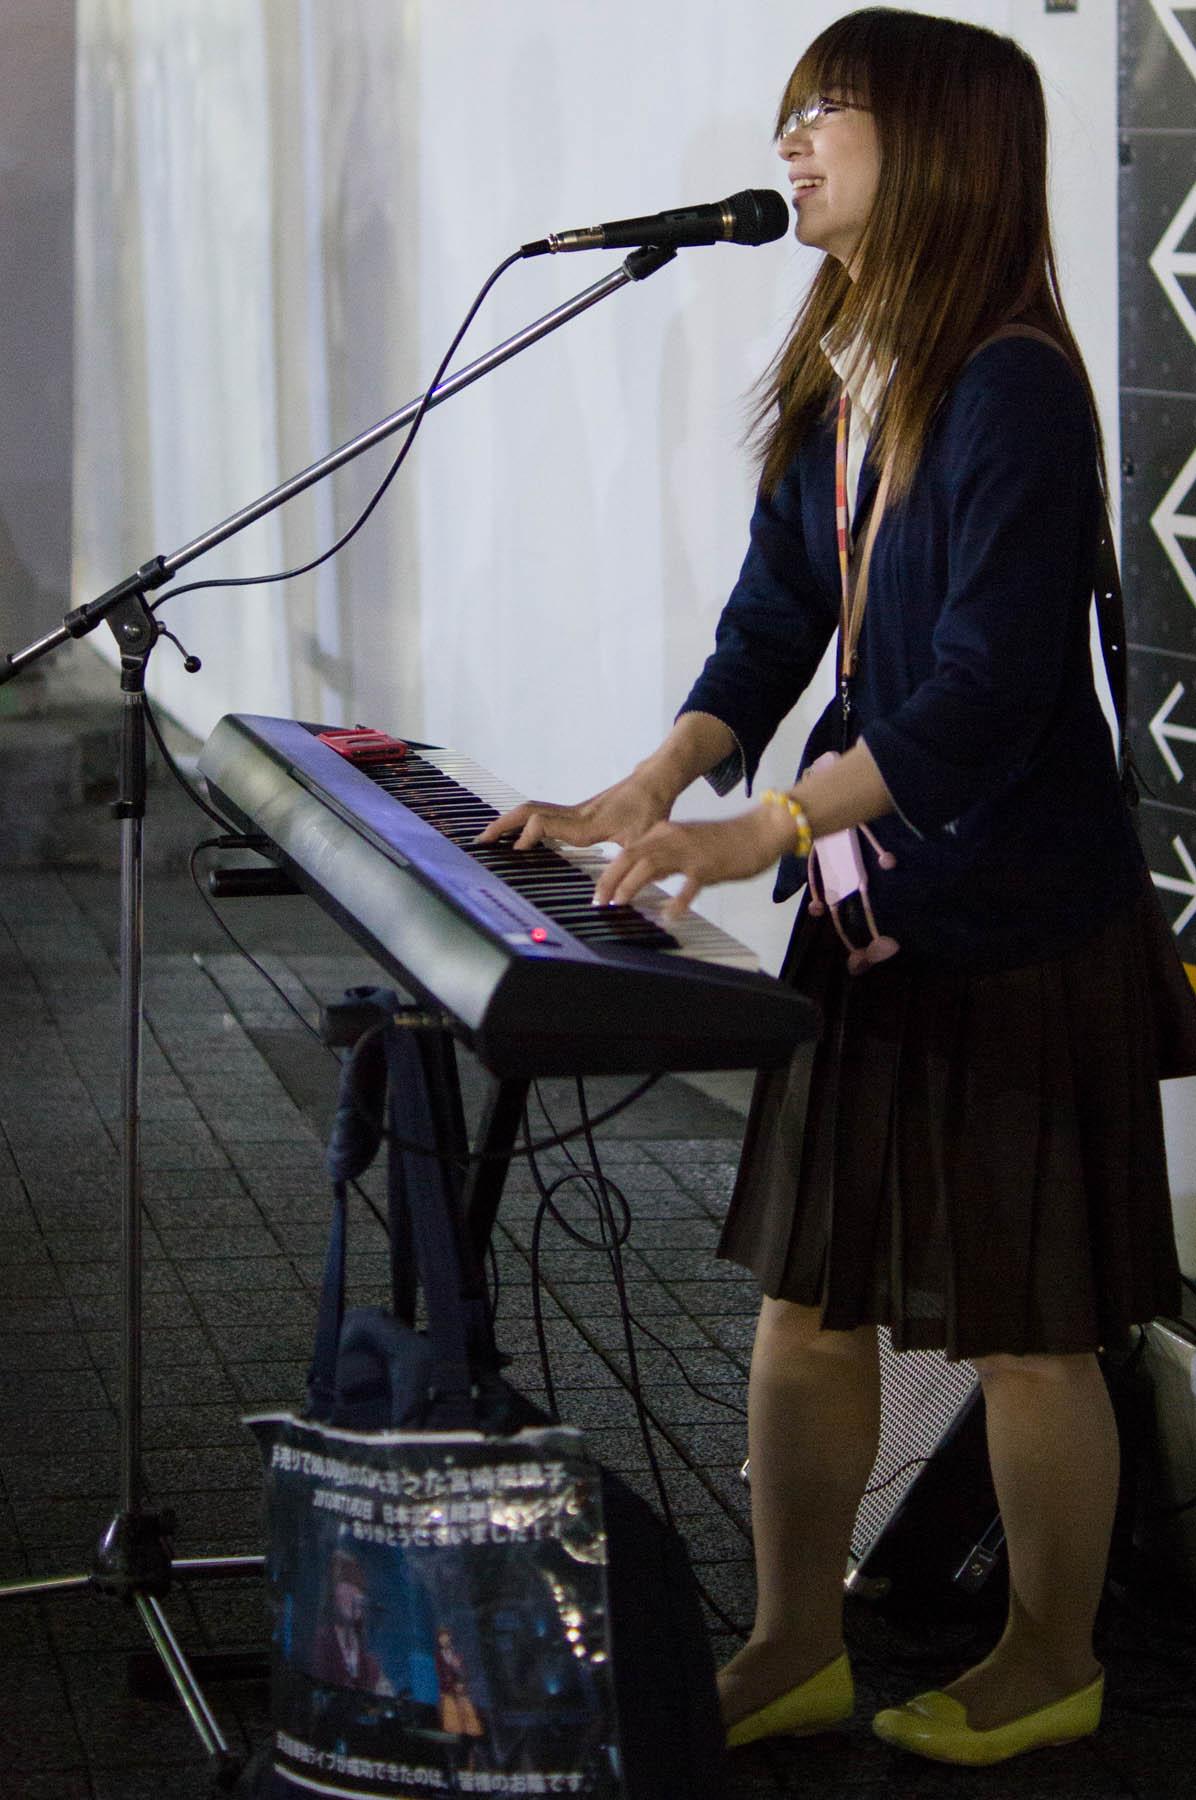 http://blogs.bizmakoto.jp/yokoyamat/2013/10/20/DSC08360M.jpg